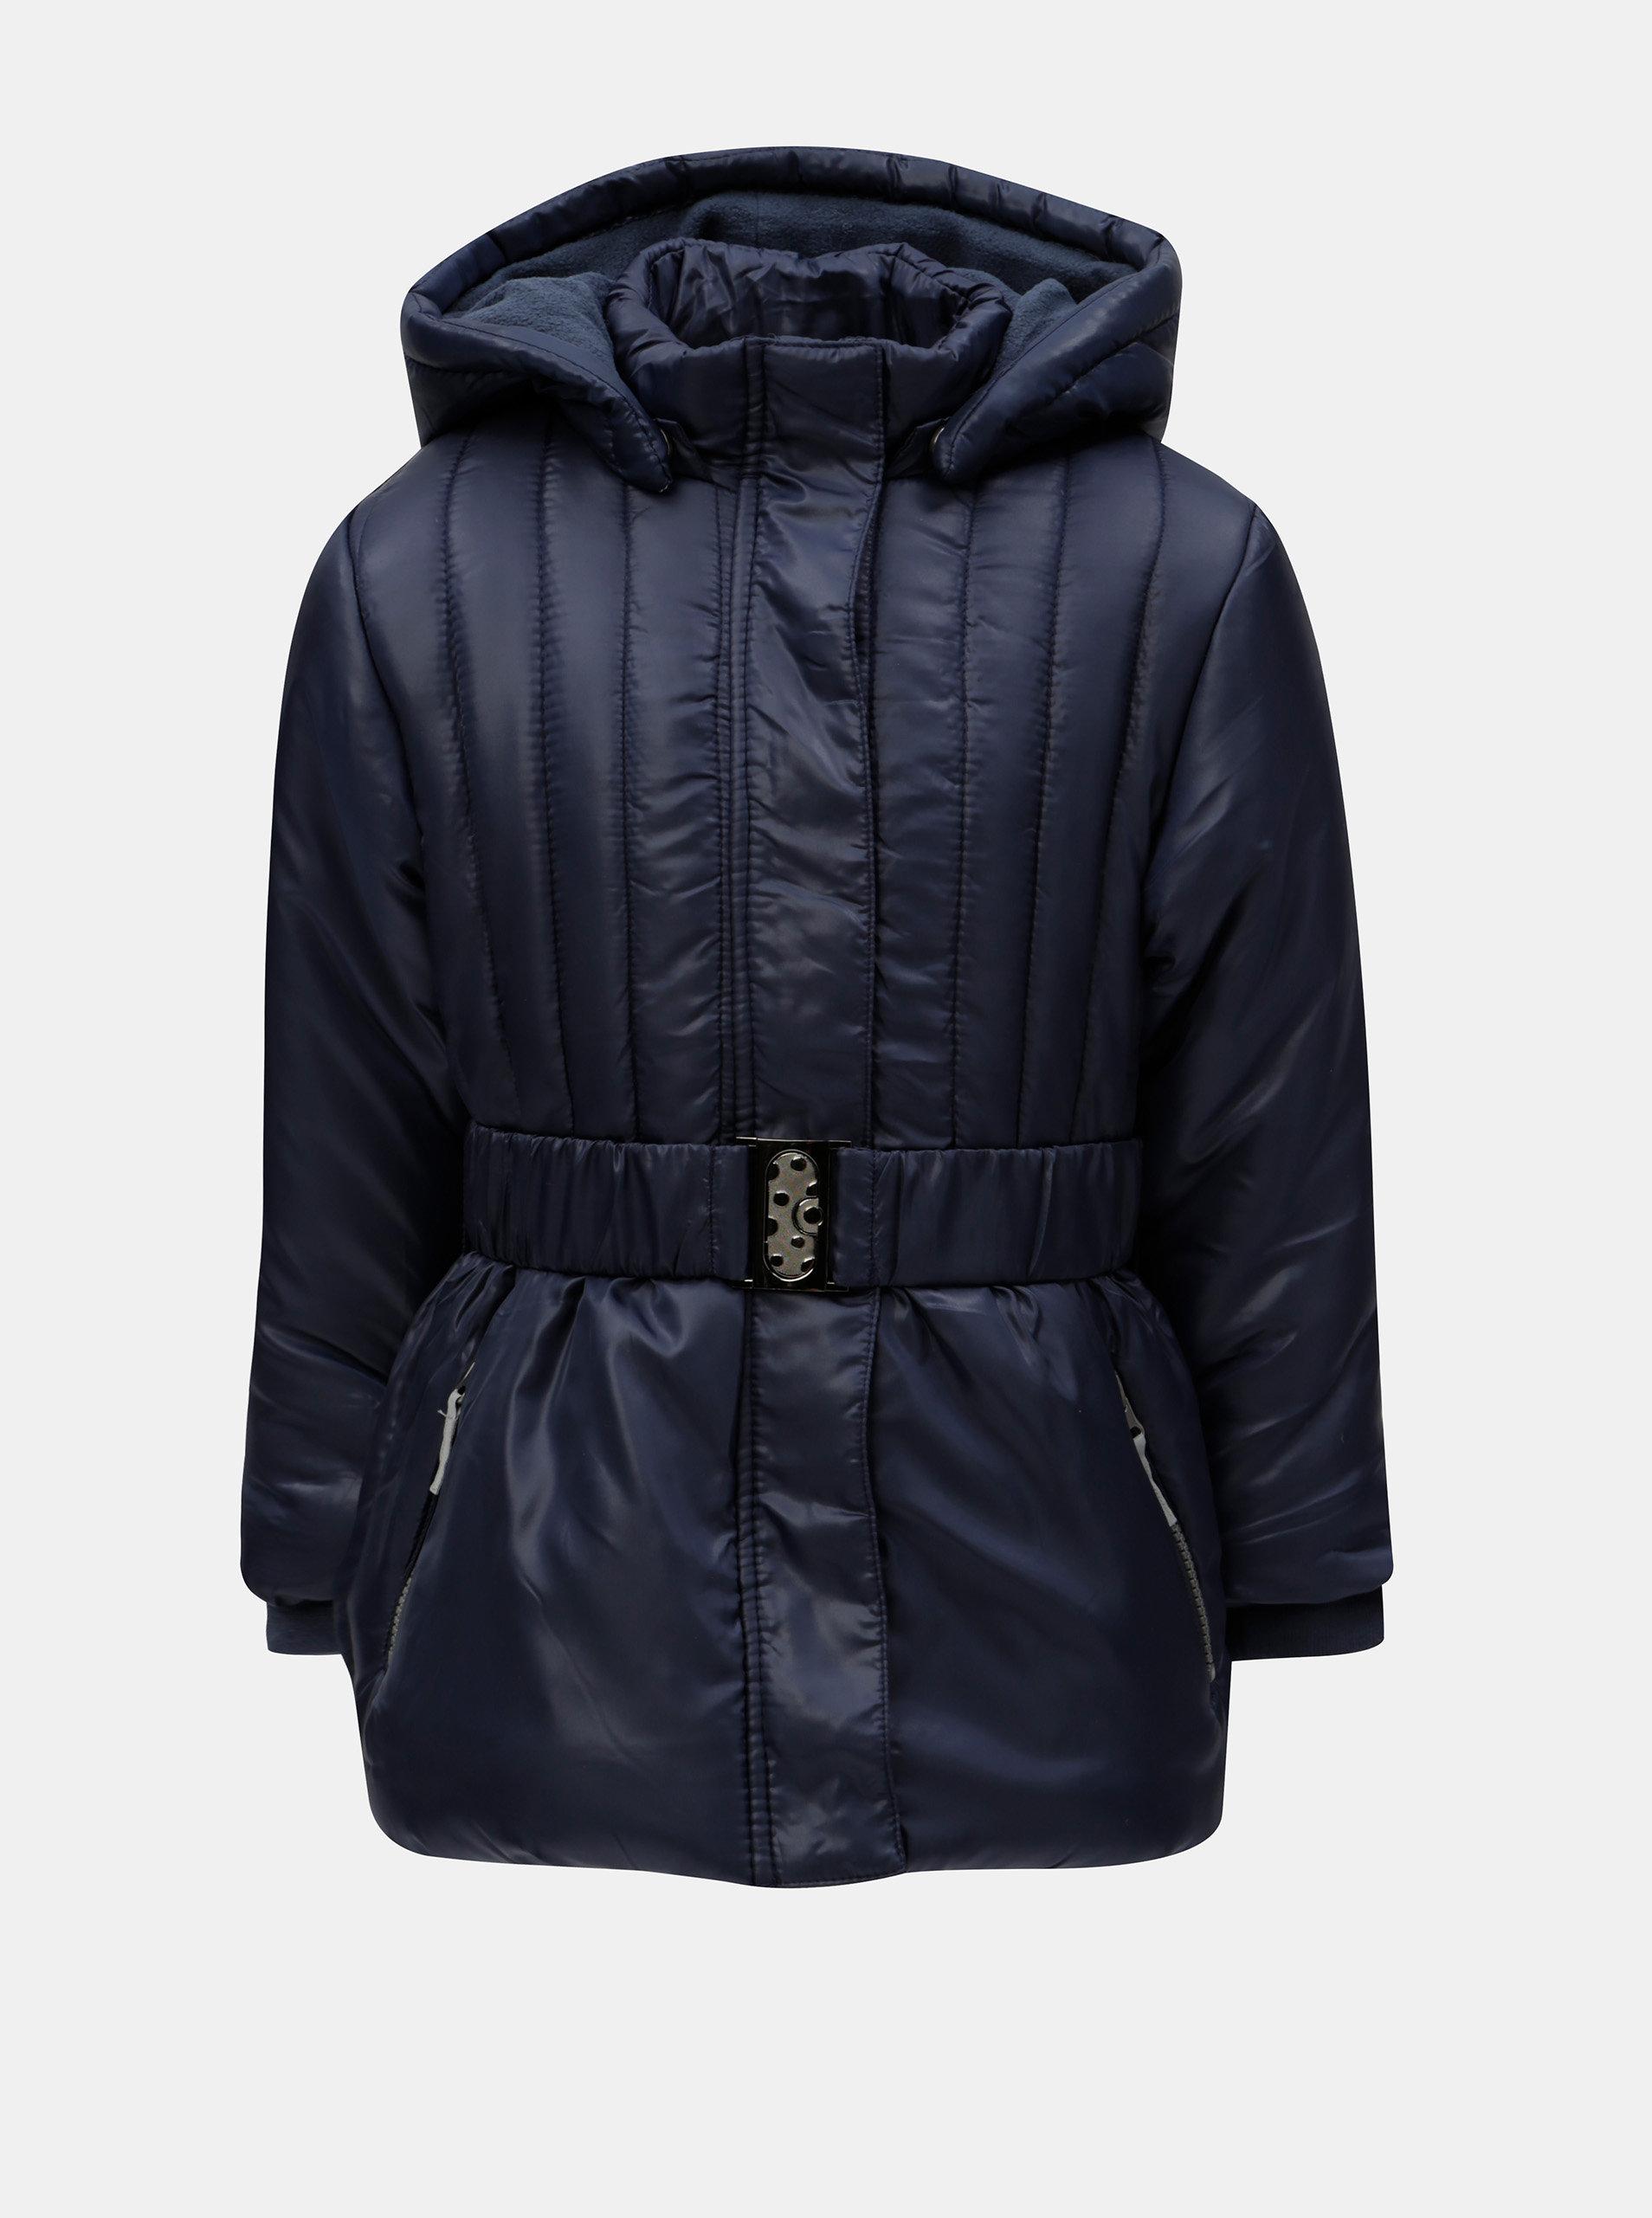 Tmavomodrá dievčenská prešívaná bunda s kapucňou a opaskom Blue Seven ... a9d0f22f0b2